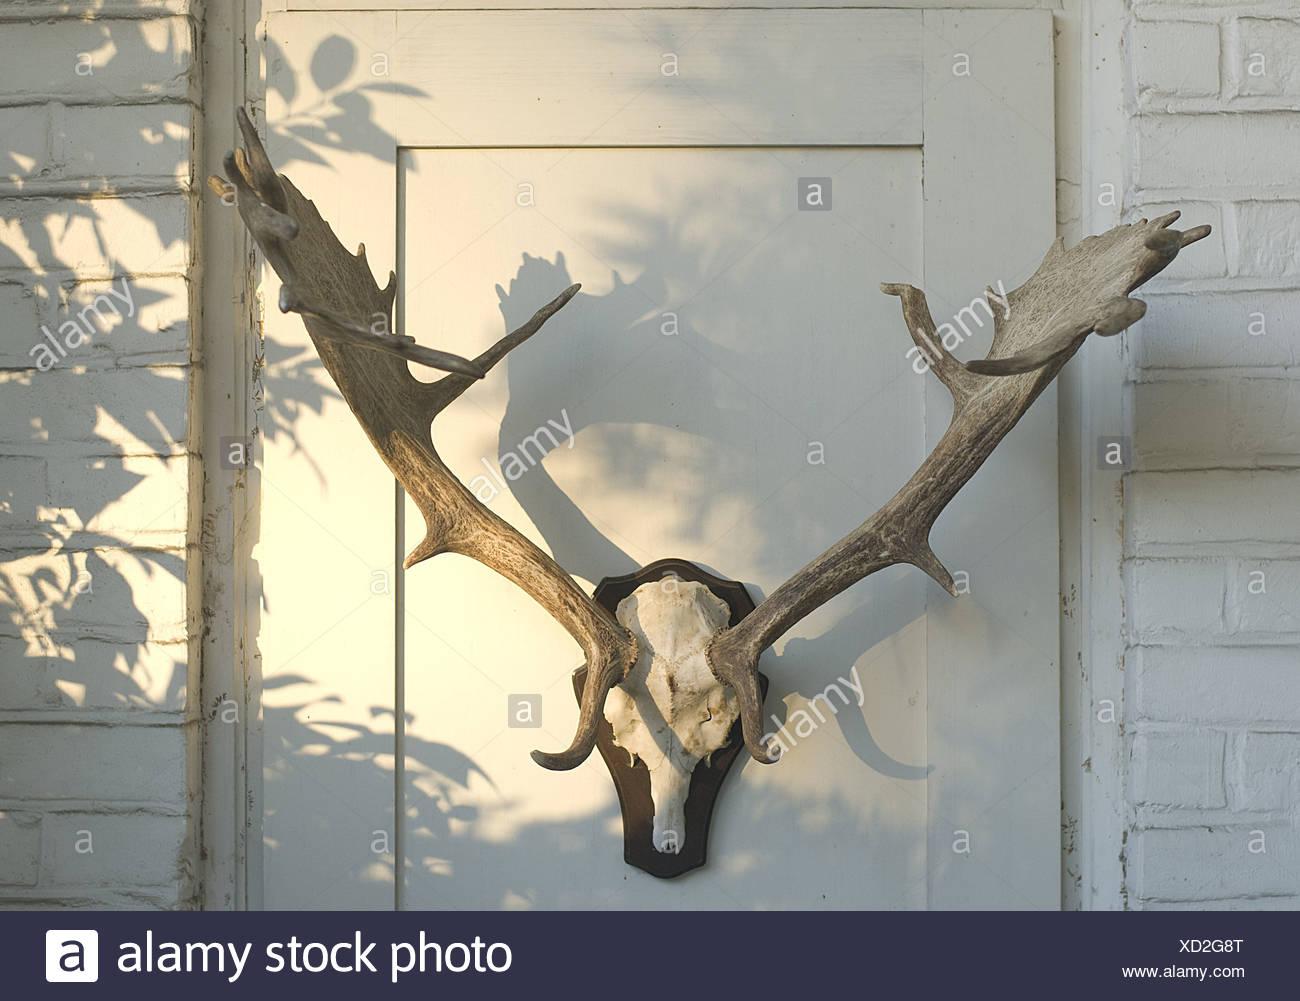 horns - Stock Image